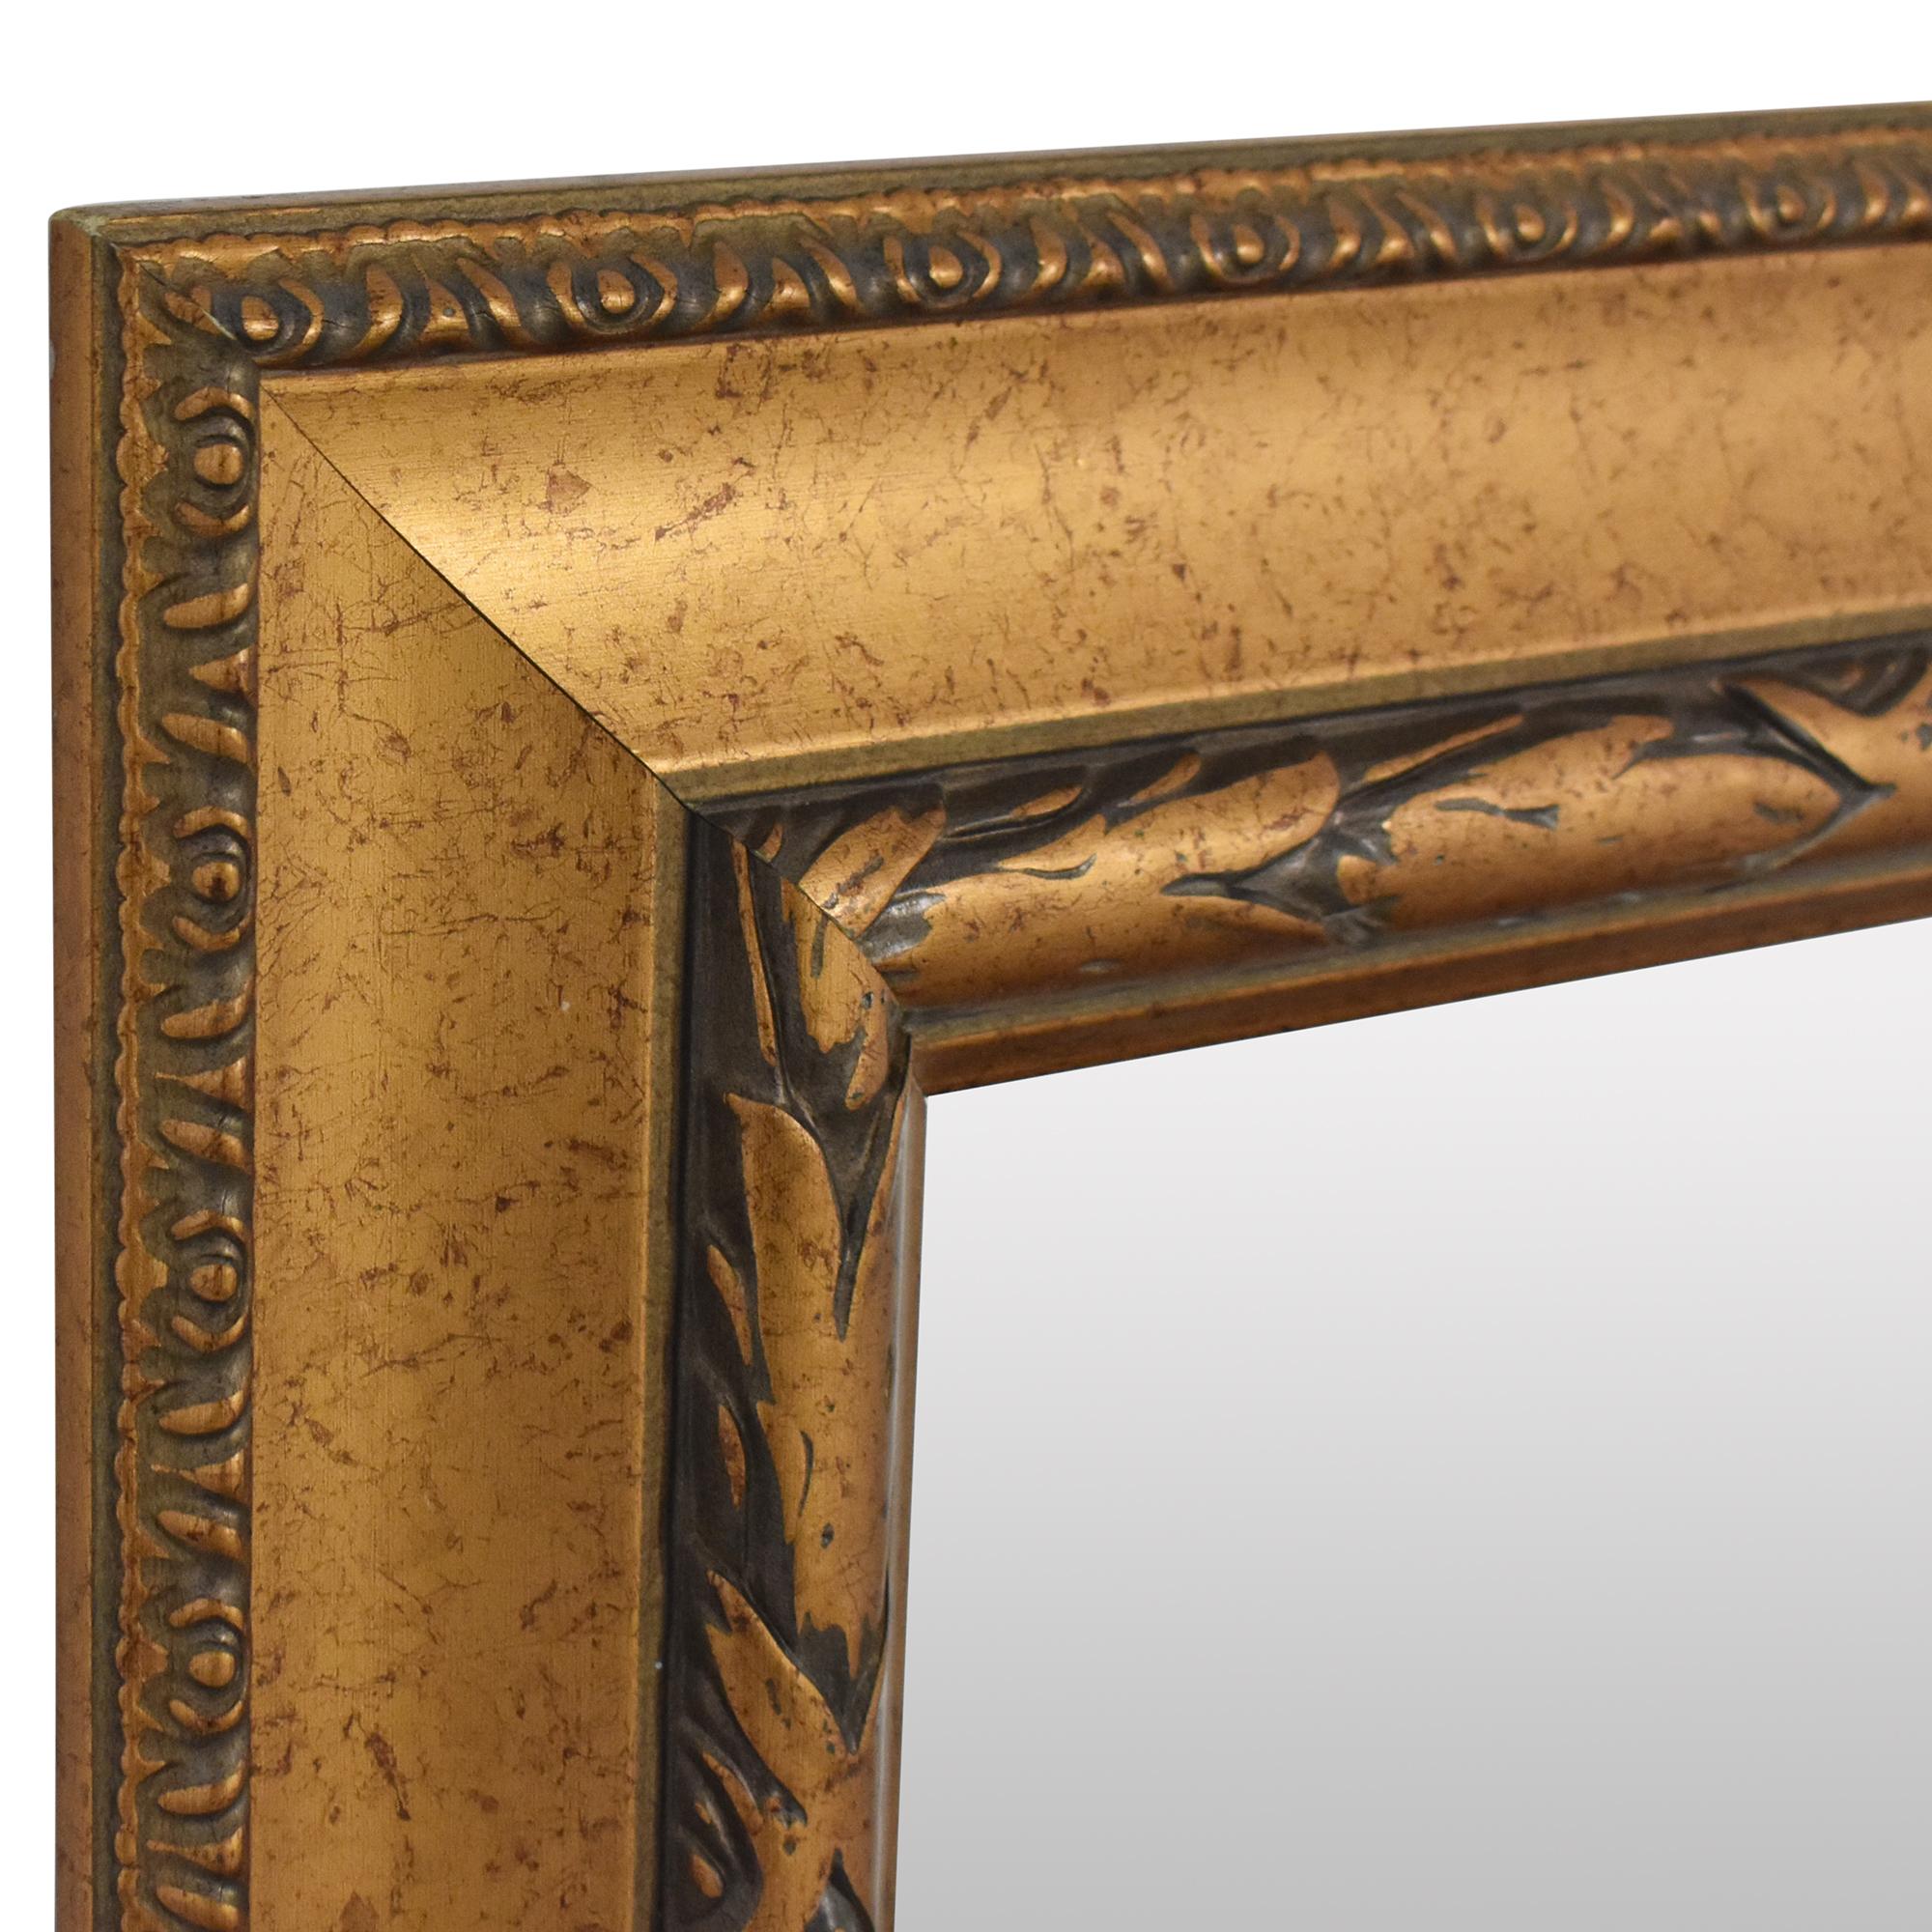 Decorative Framed Mirror for sale